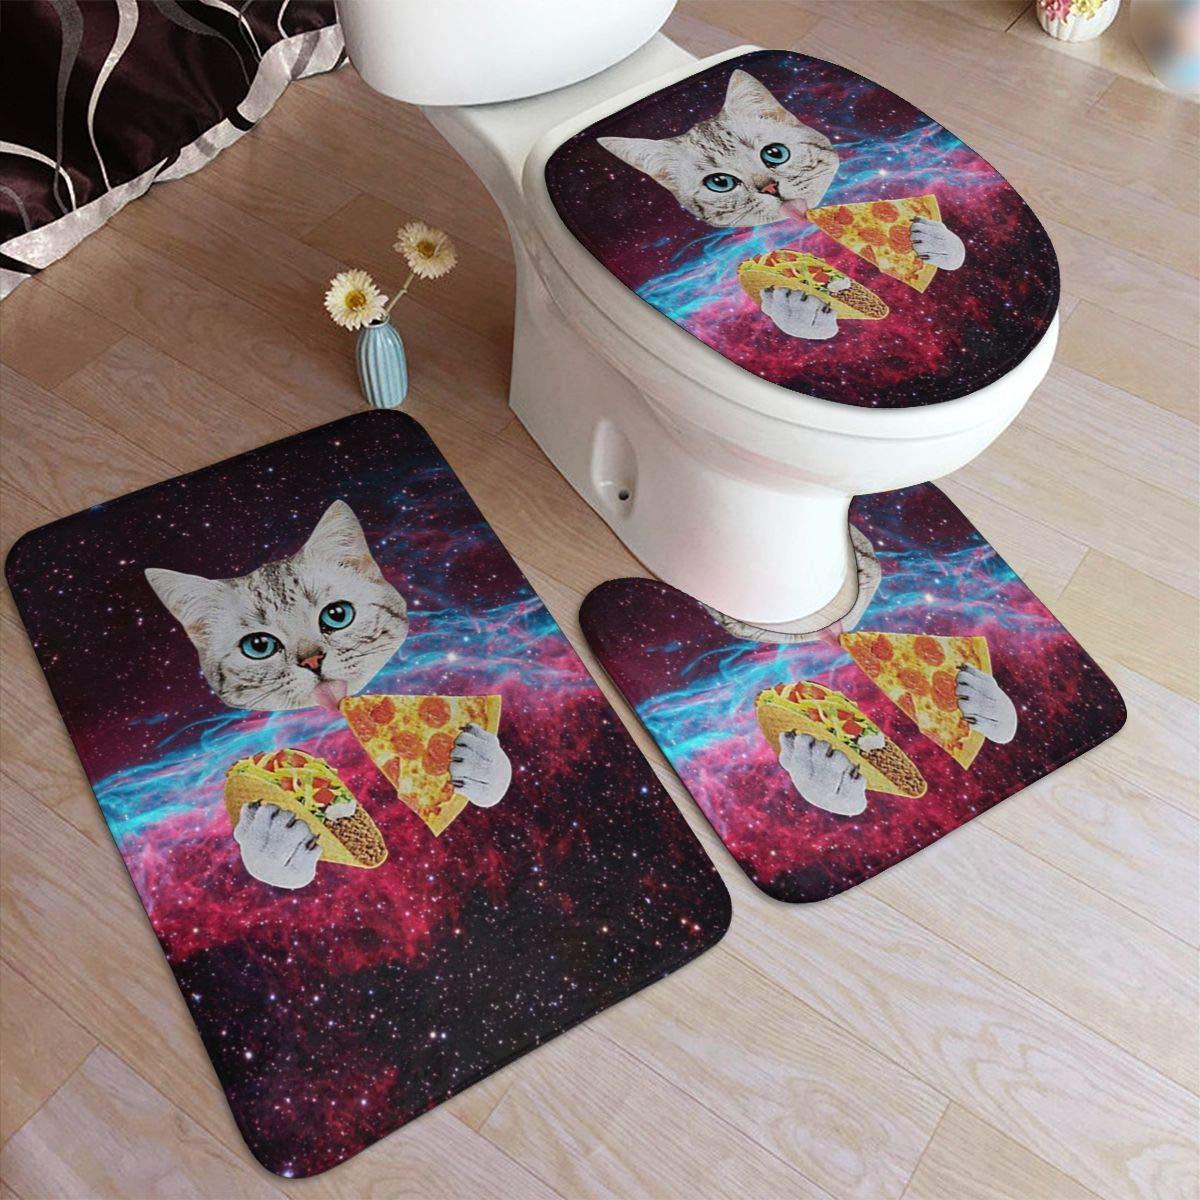 Toilet Lid Cover U Shape Soft Microfiber Non-Slip Washable Floor Rug for Tub Shower Spa Bath Mat Contour Rug 3D Galaxy Pizza Cat 3 Piece Bathroom Rug Set